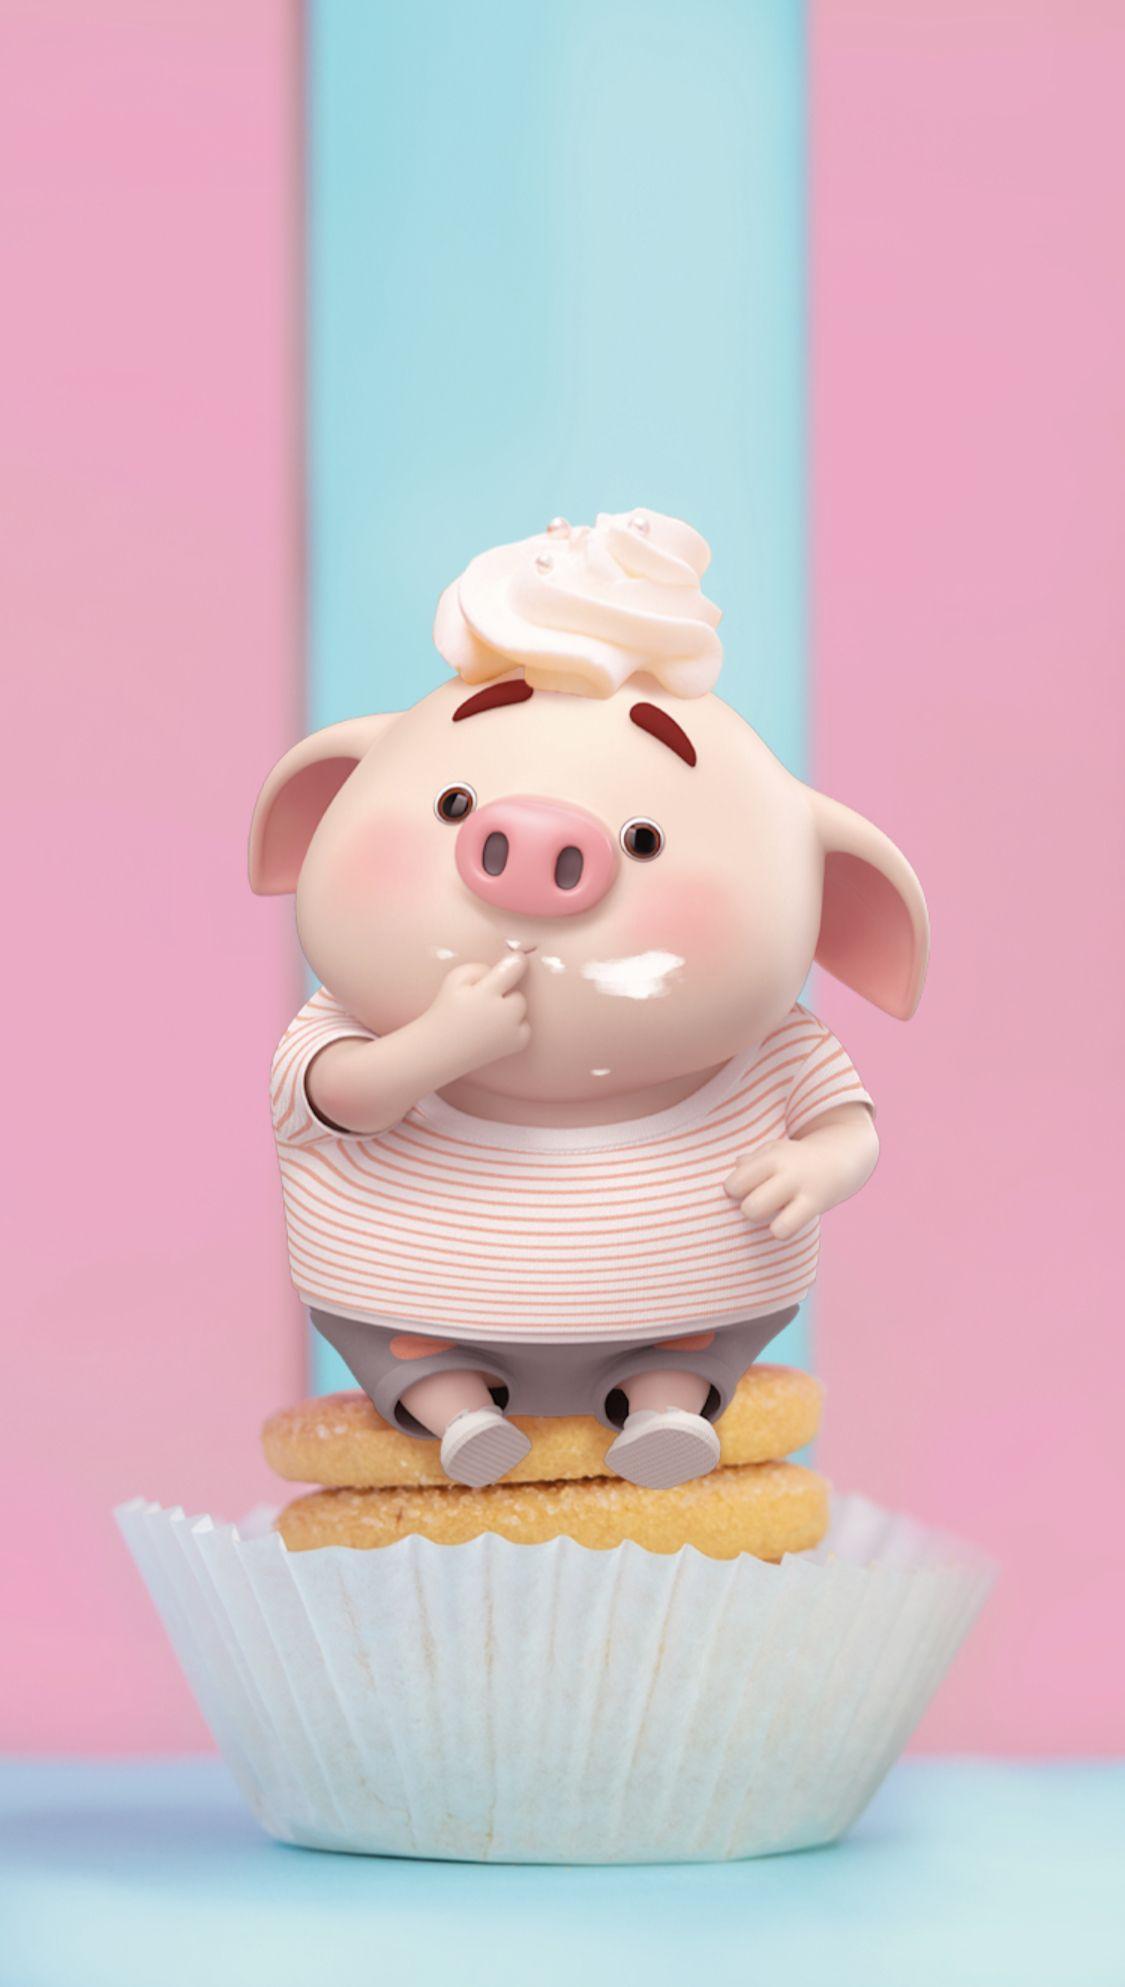 Little Pig ล กหม วอลเปเปอร คาวาอ